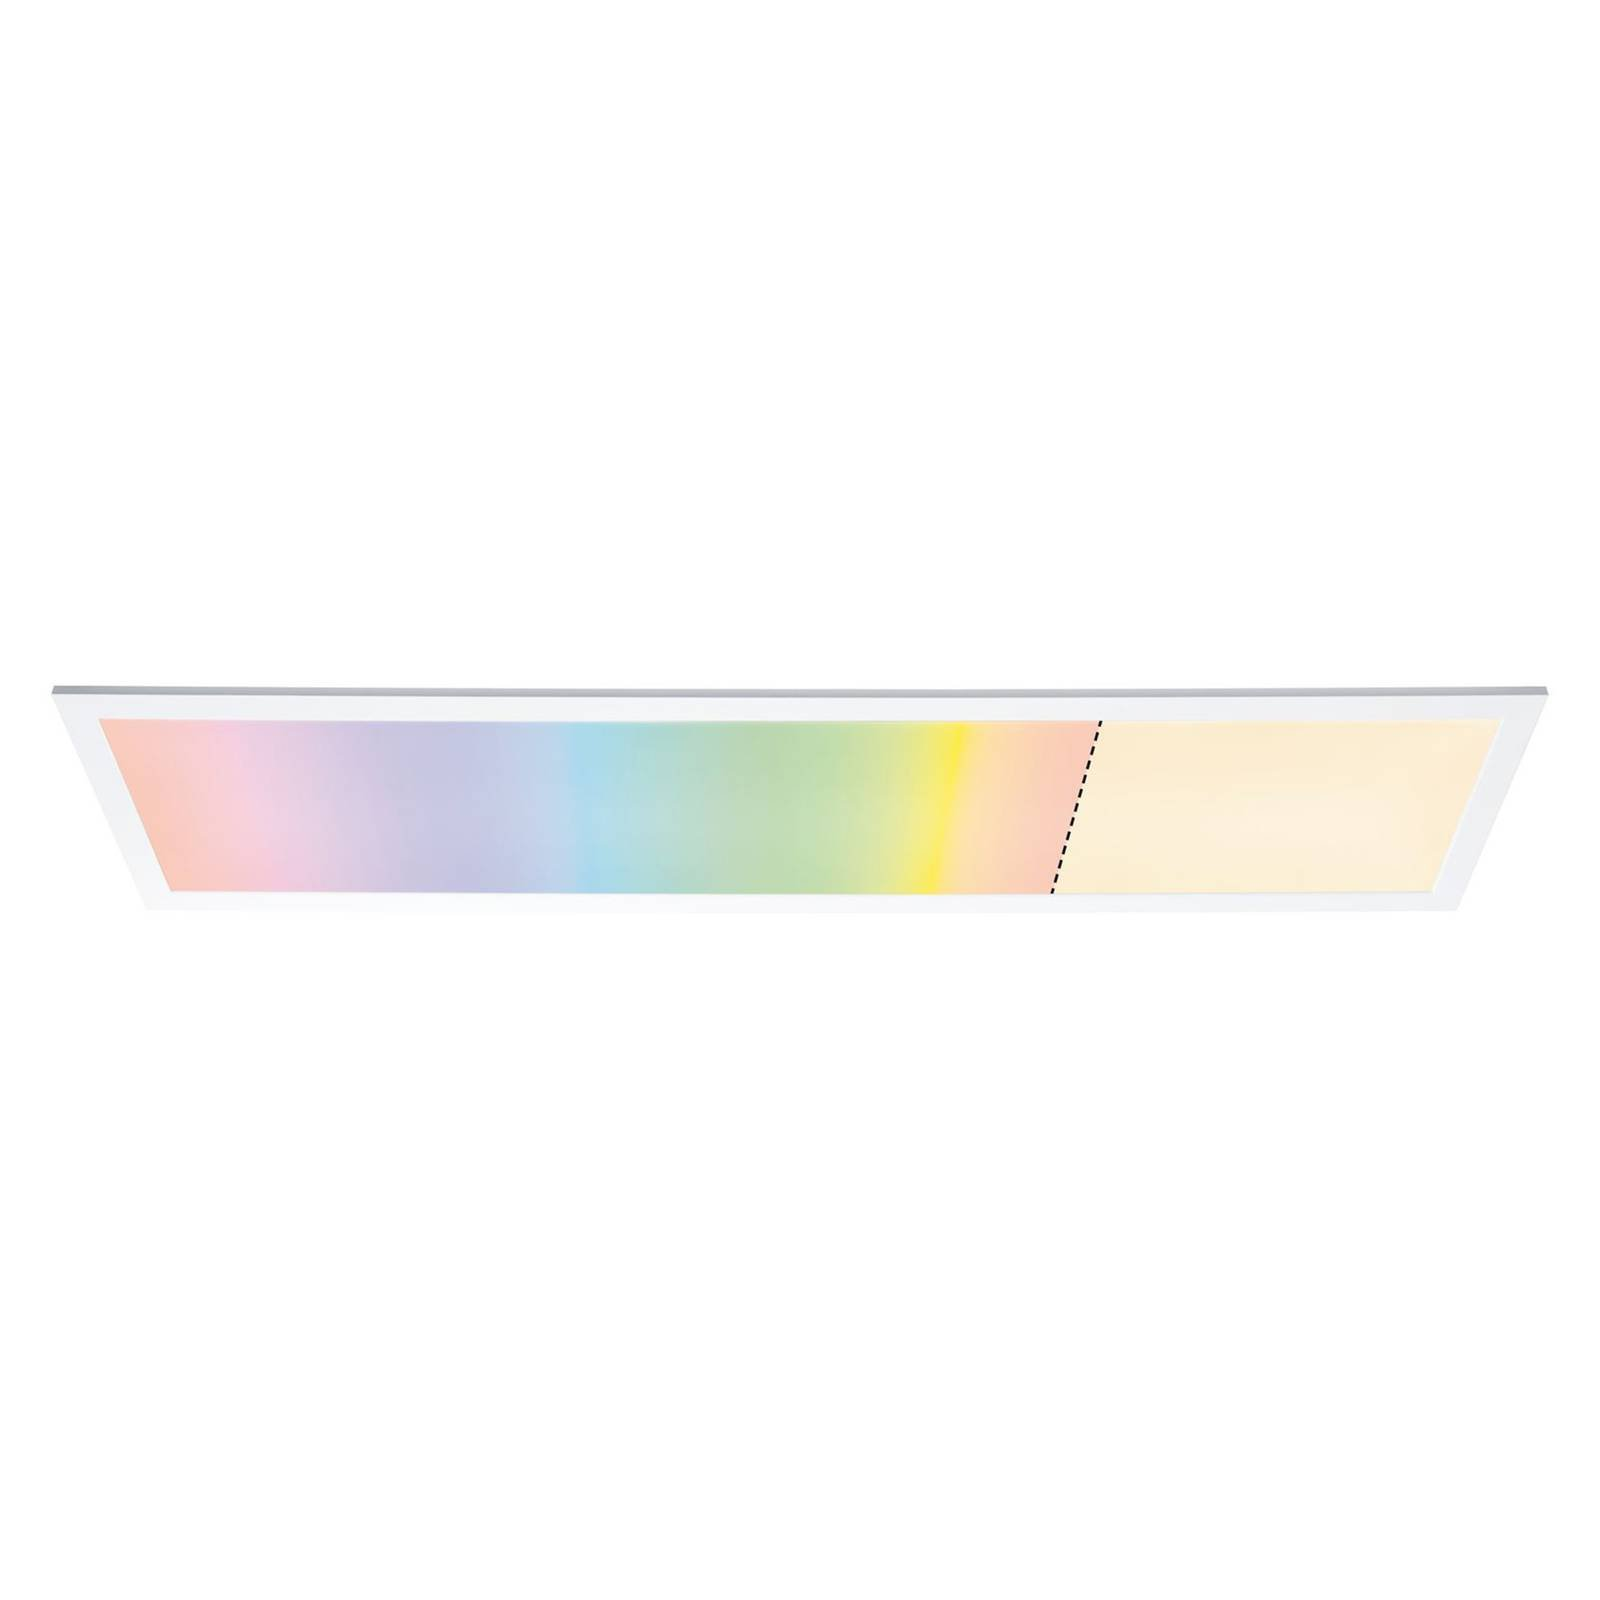 Paulmann Amaris LED-panel, ZigBee, 120x30cm, RGBW